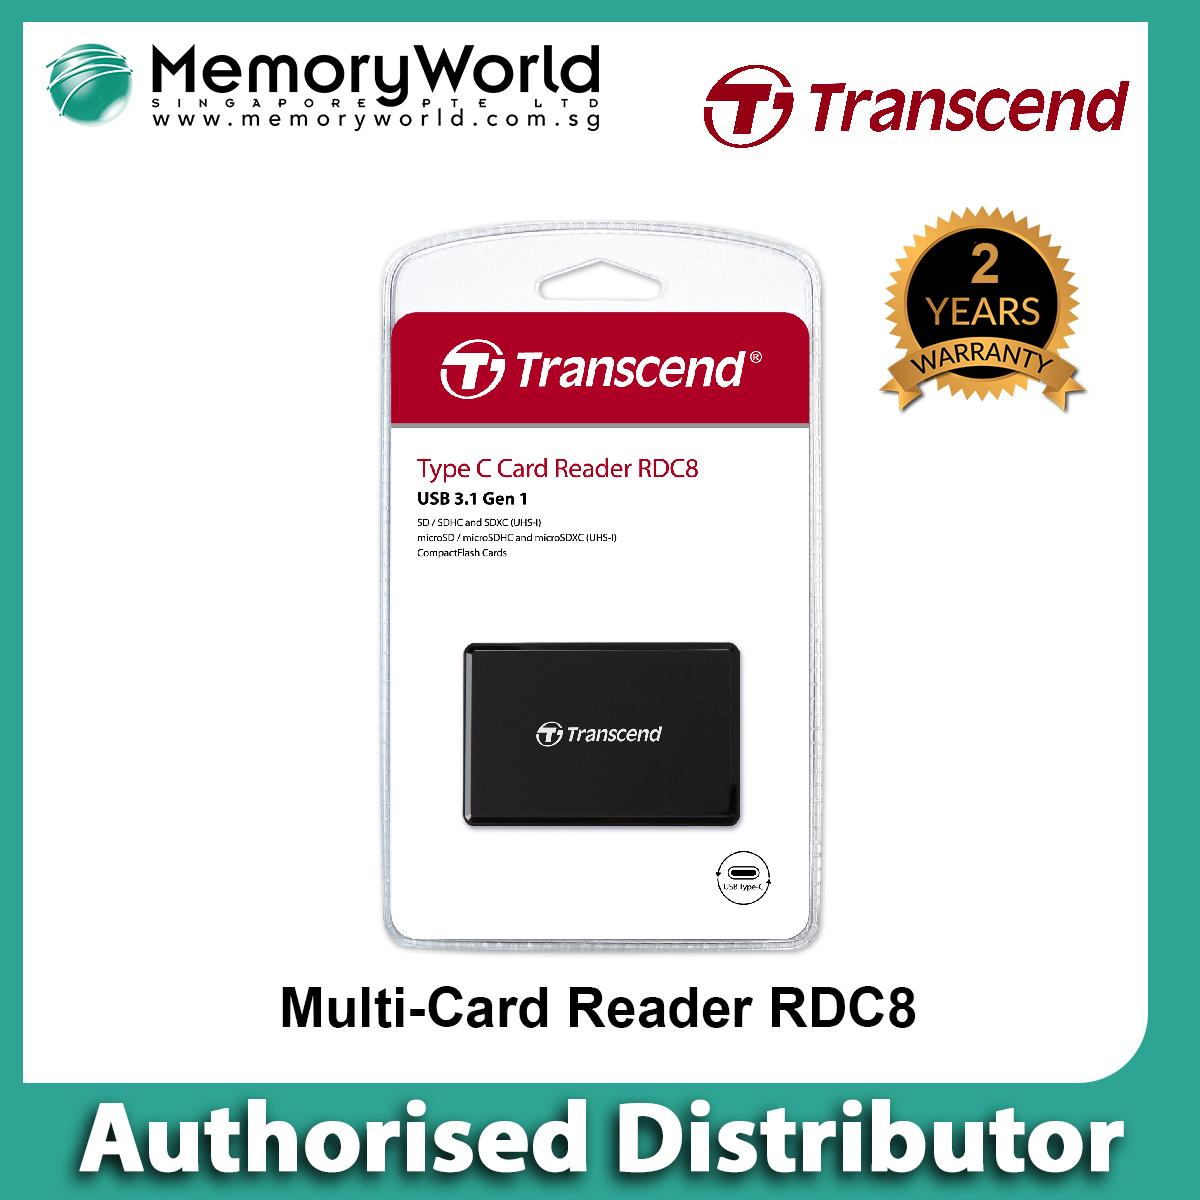 Transcend USB 3.1 Multi Card Reader (Black) - Type C . Warranty: 2 years. Local Singapore Warranty. **TRANSCEND Authorised Distributor **